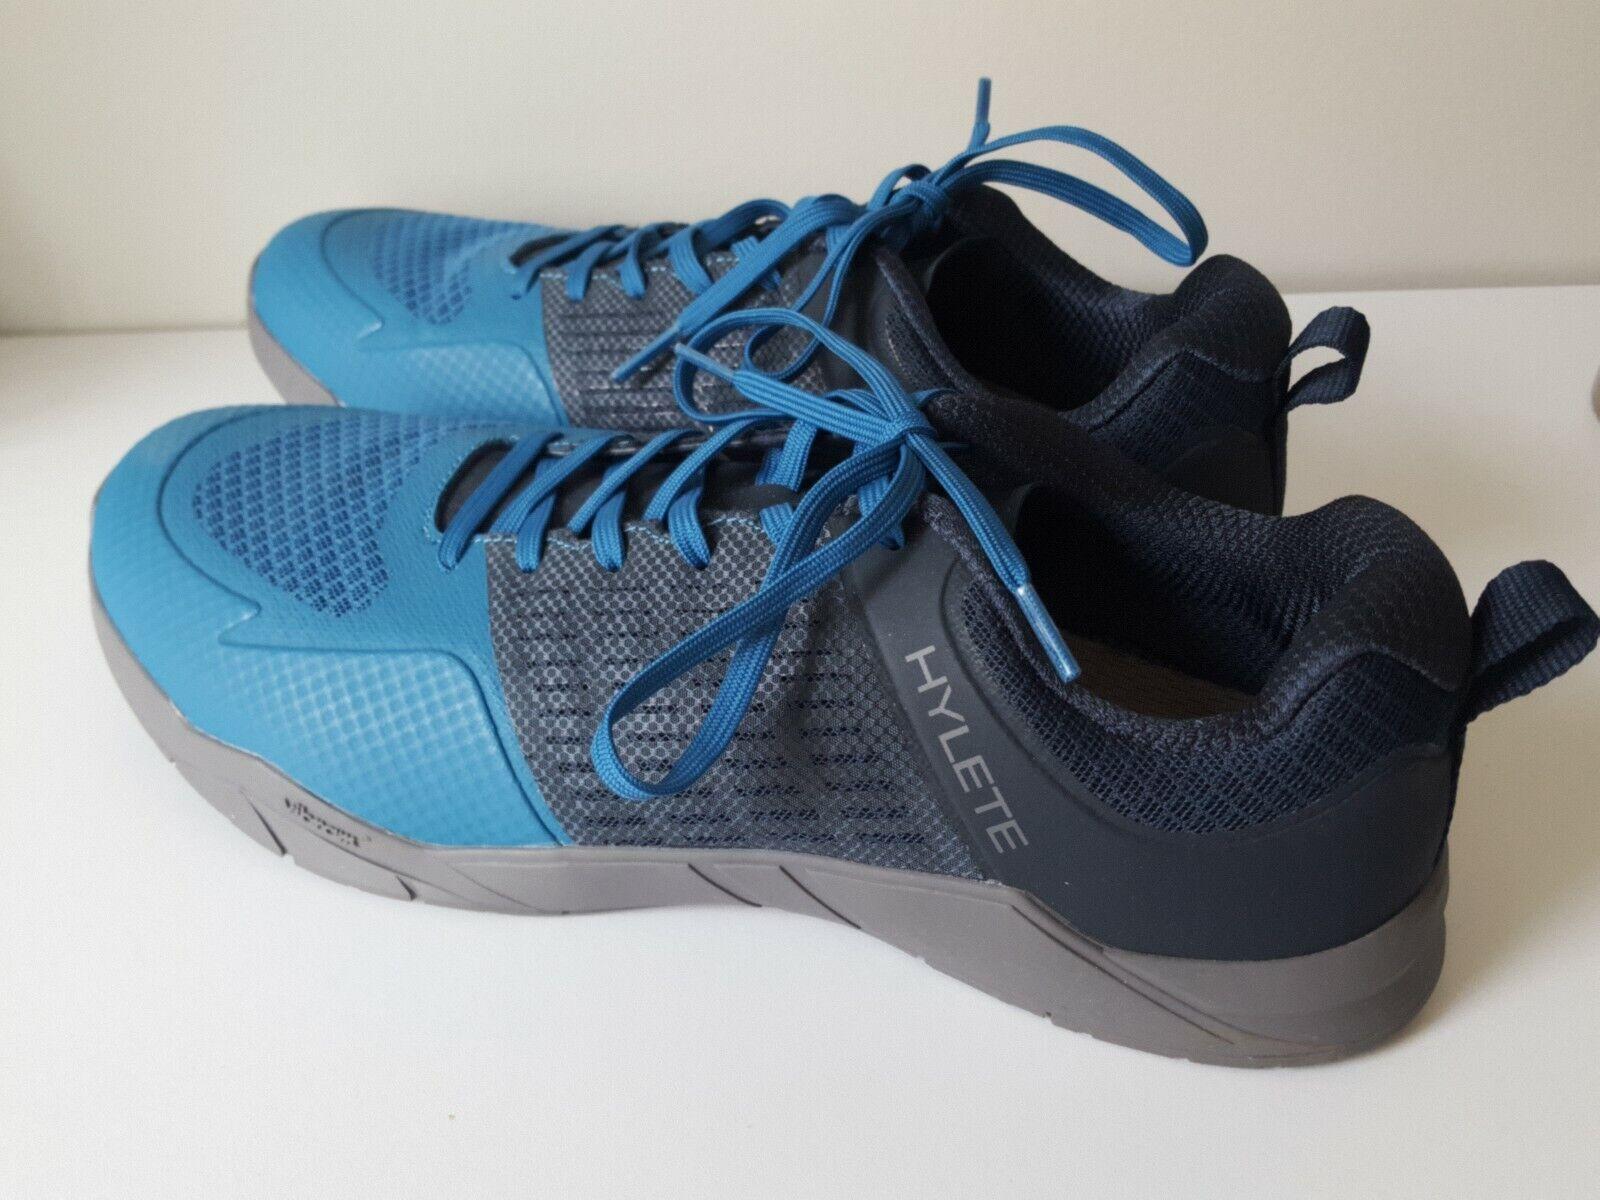 Nuevo Sin Caja HYLETE Circuit Azul para Hombre Cross-Training zapatos 11 1 2 nuevo Ret